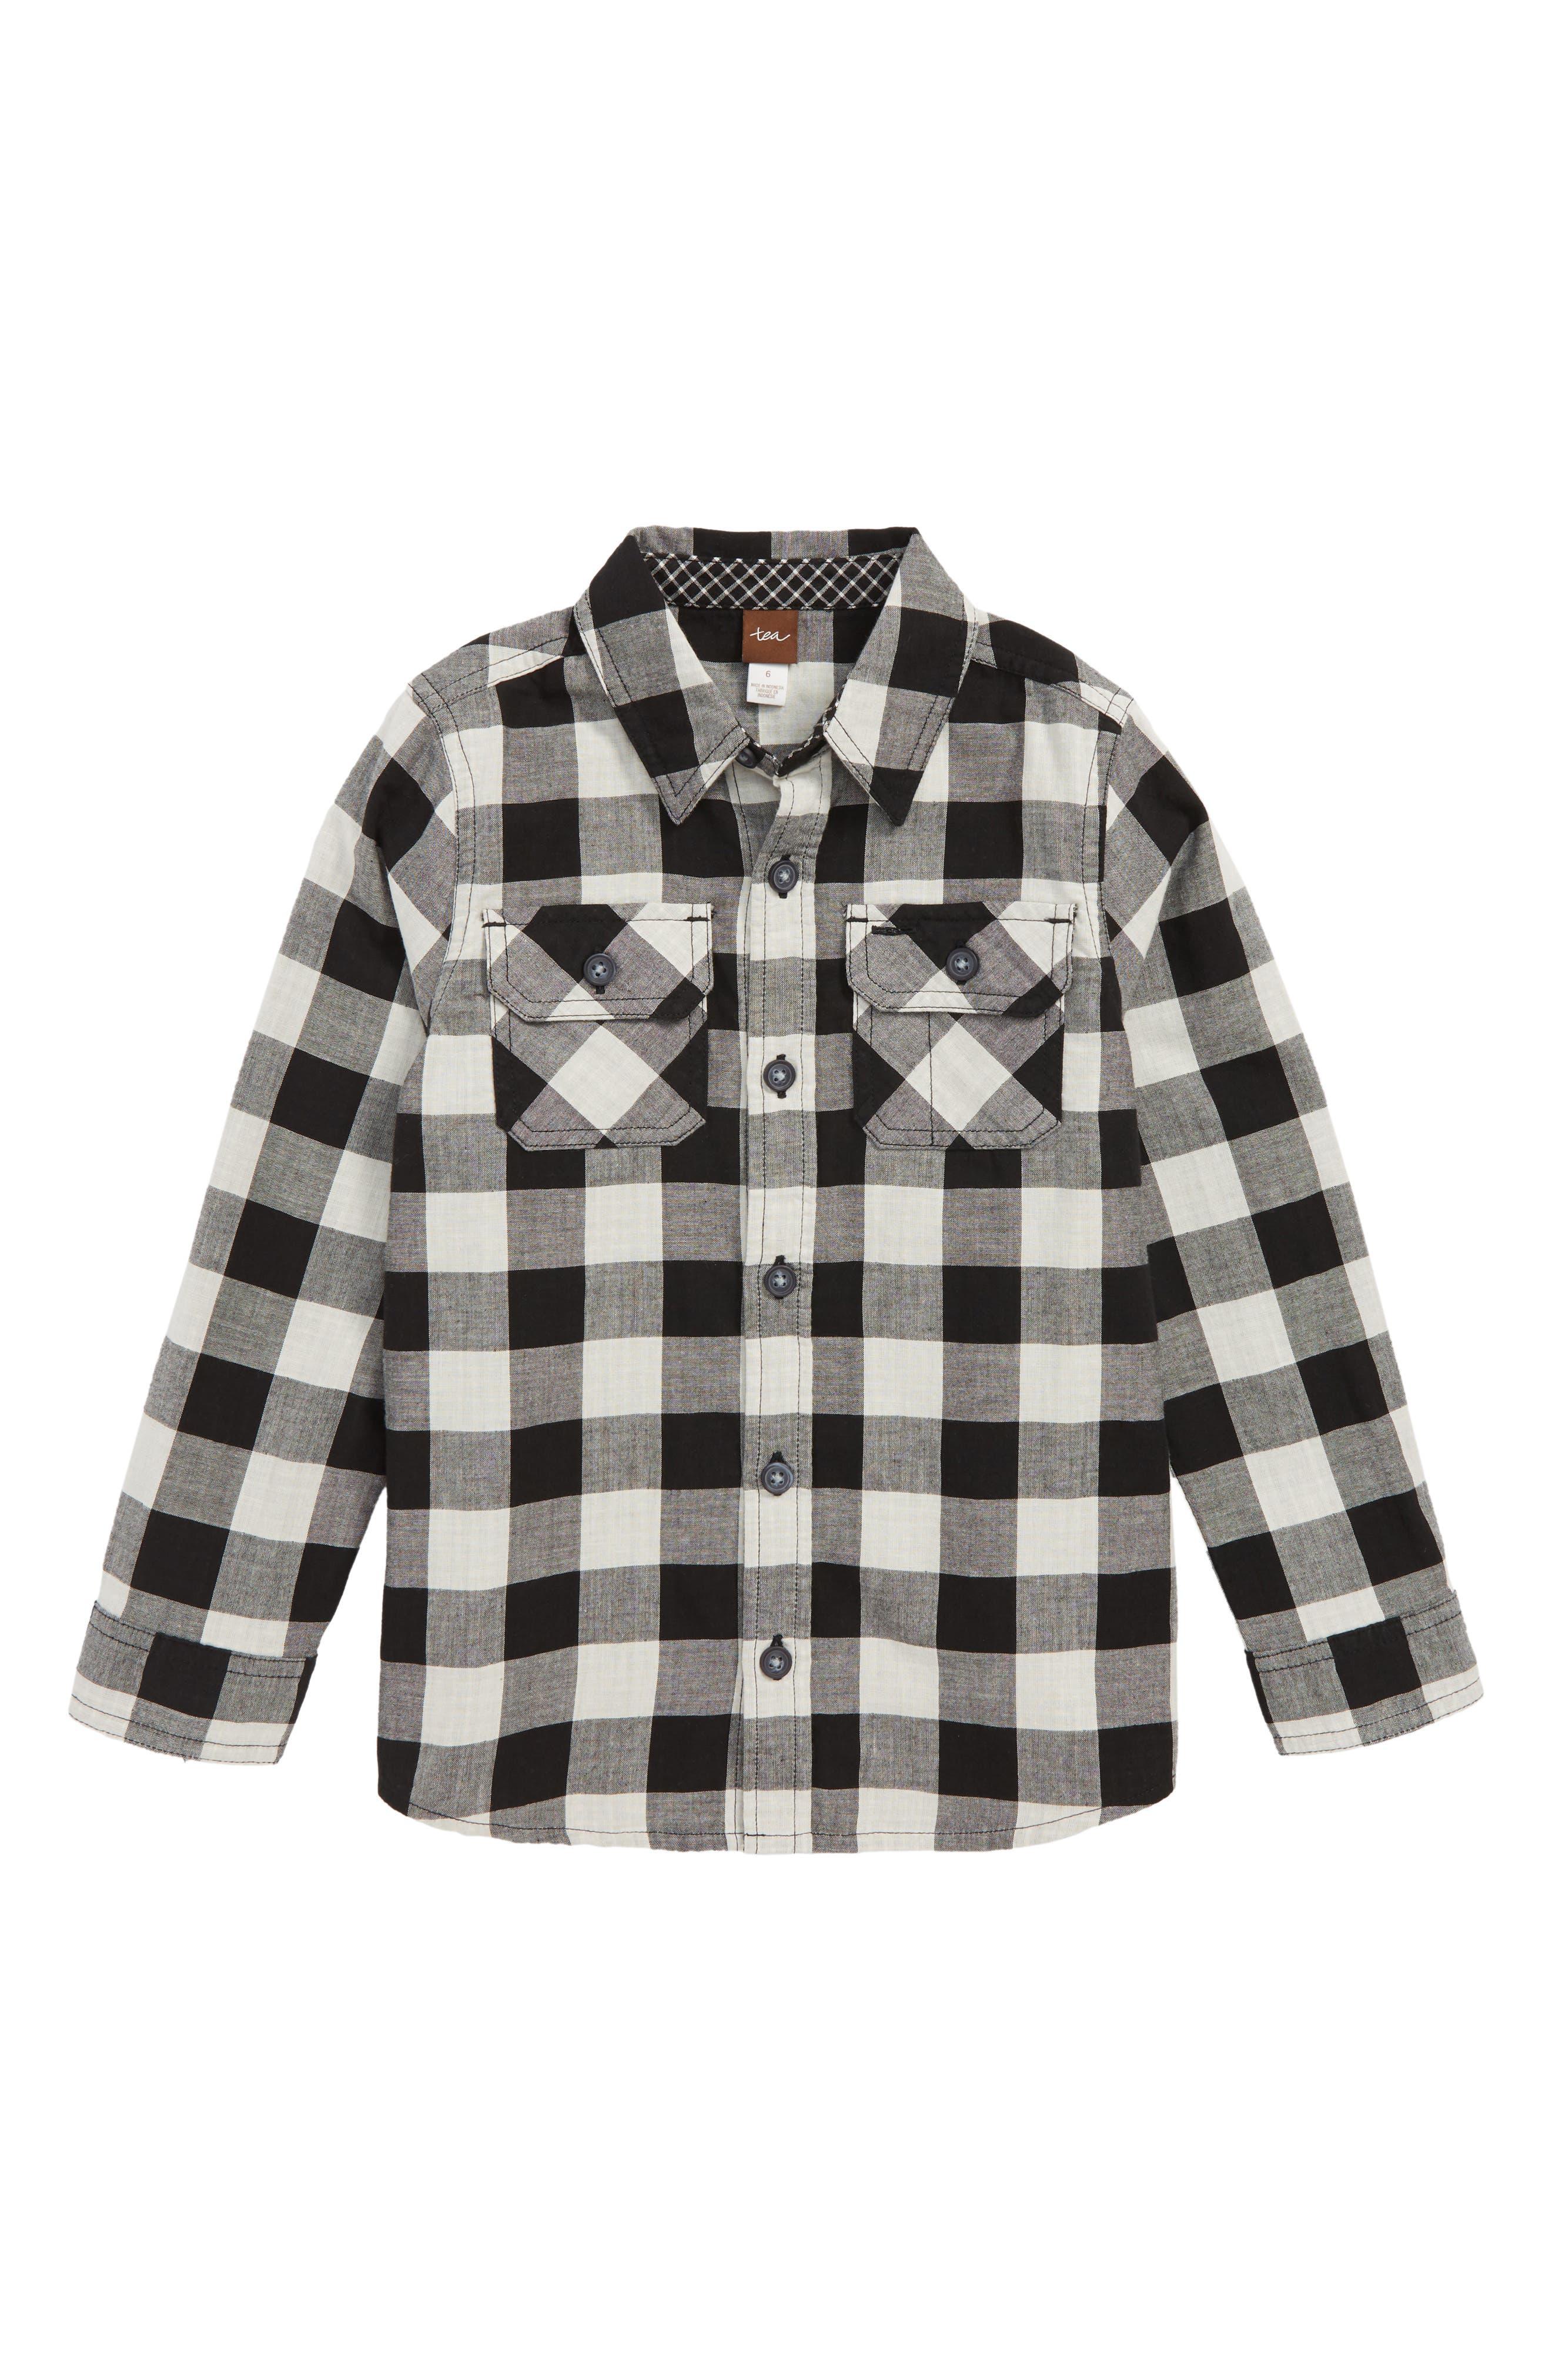 Double Weave Plaid Shirt,                             Main thumbnail 1, color,                             CHECKERED PLAID